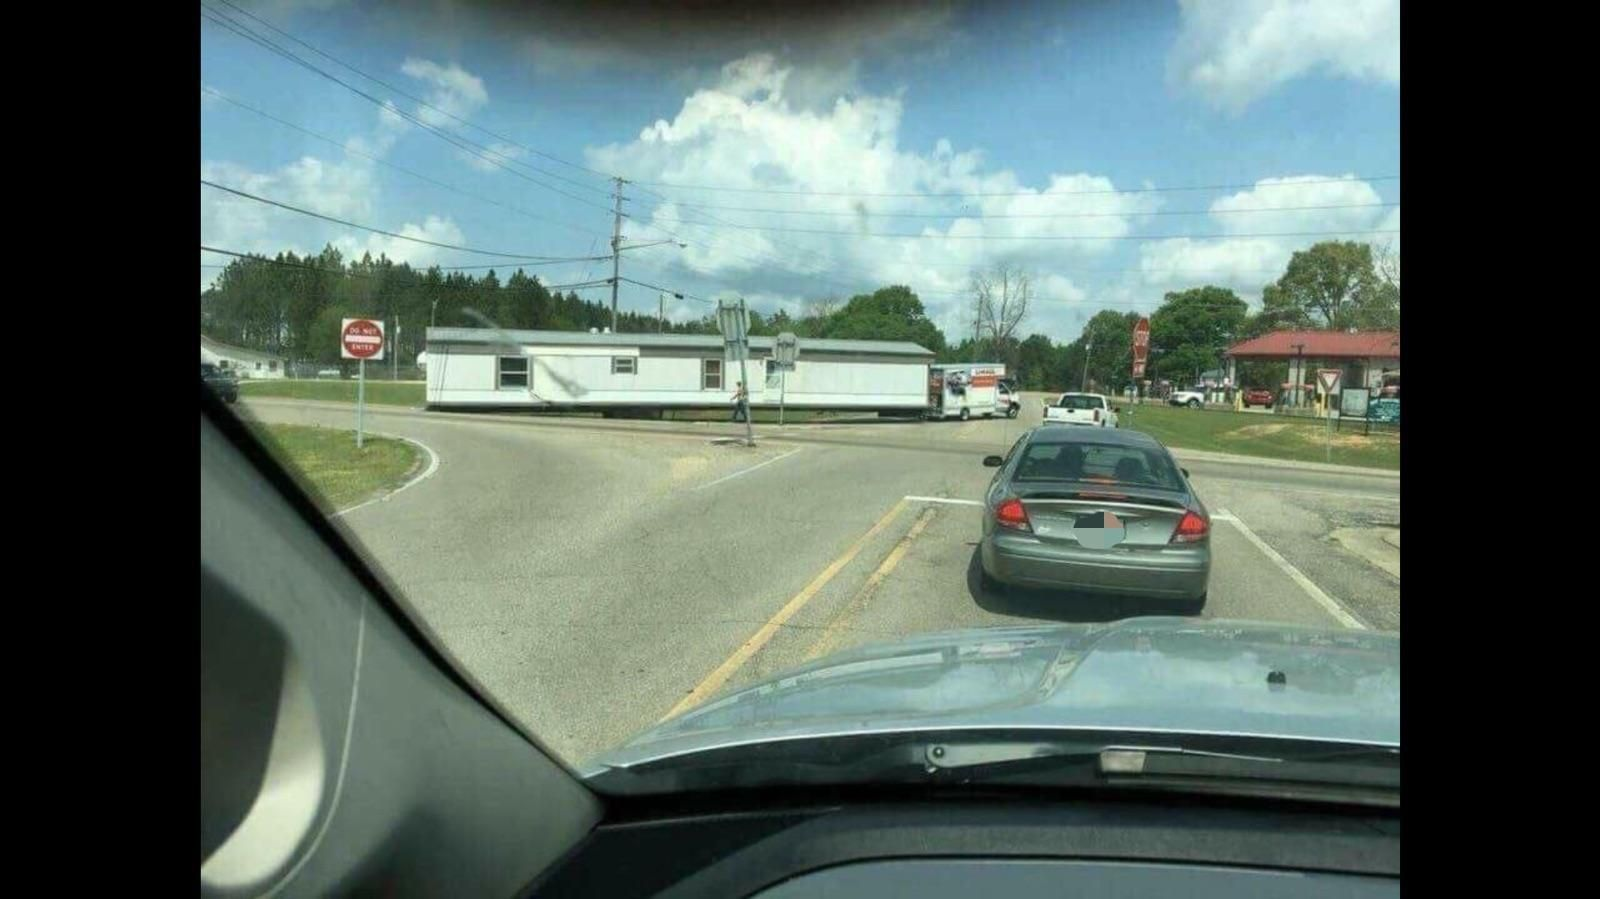 Moving Day Texas Style forklift osha forkliftlicense